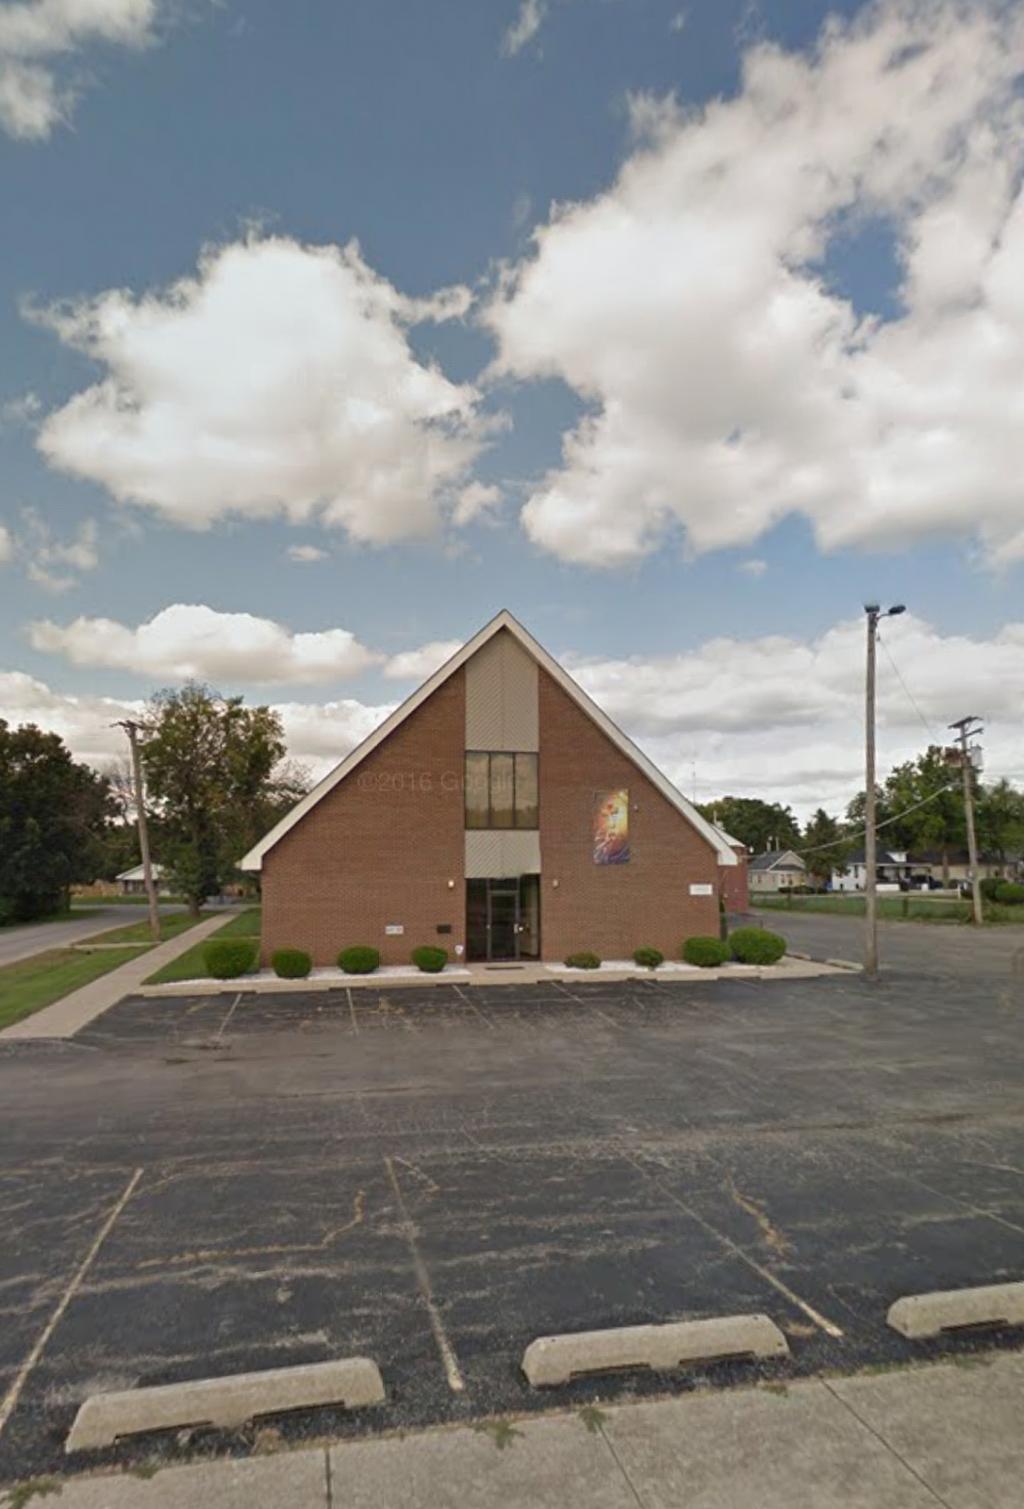 Iglesia de Dios Pentecostal M.I Fe y Poder - church  | Photo 2 of 6 | Address: 200 Rev Walton Dr, Lockport, IL 60441, USA | Phone: (219) 671-9129